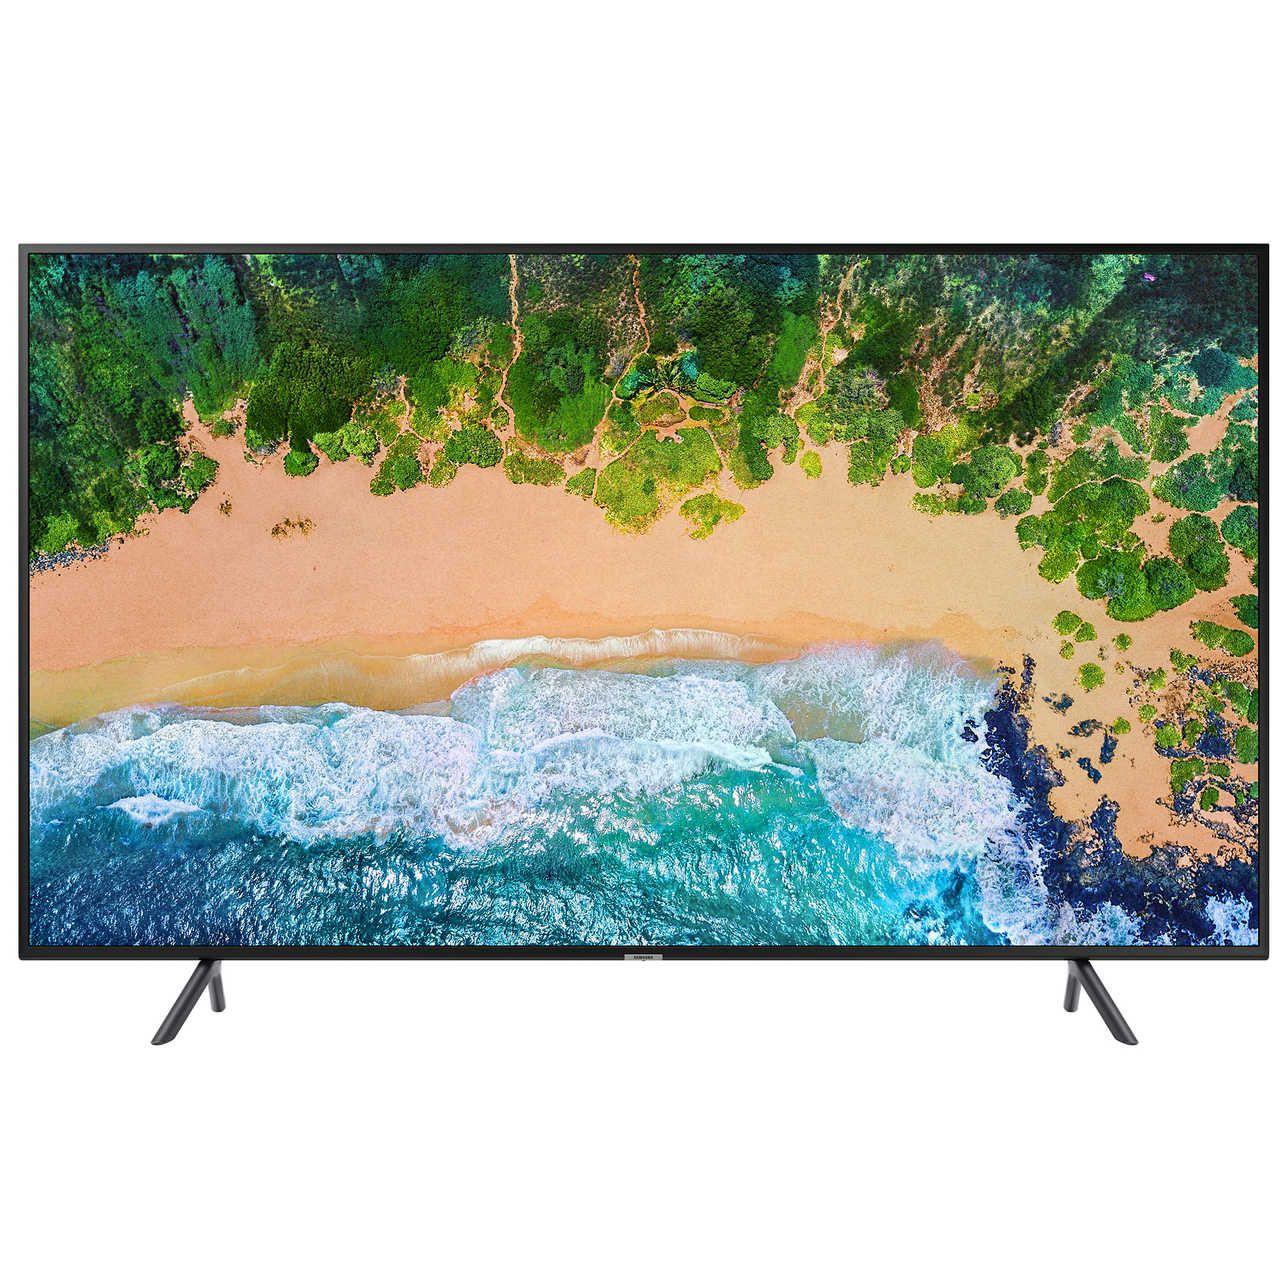 Televizor LED Smart Samsung, 123 cm, 49NU7102, 4K Ultra HD